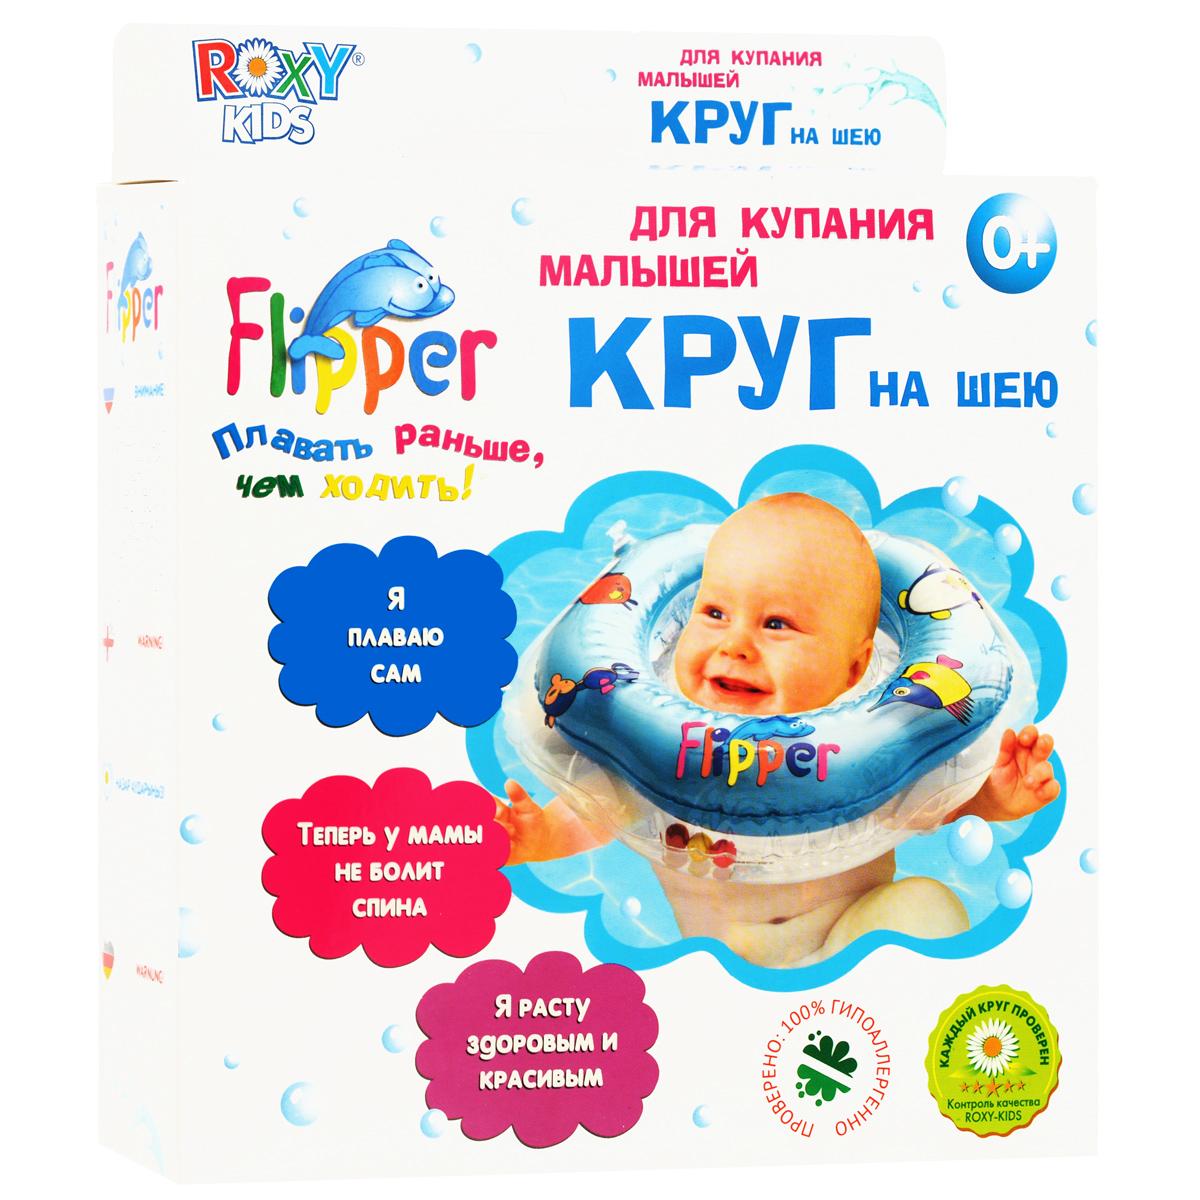 "Круг на шею для купания Roxy-Kids ""Flipper"", цвет: голубой"